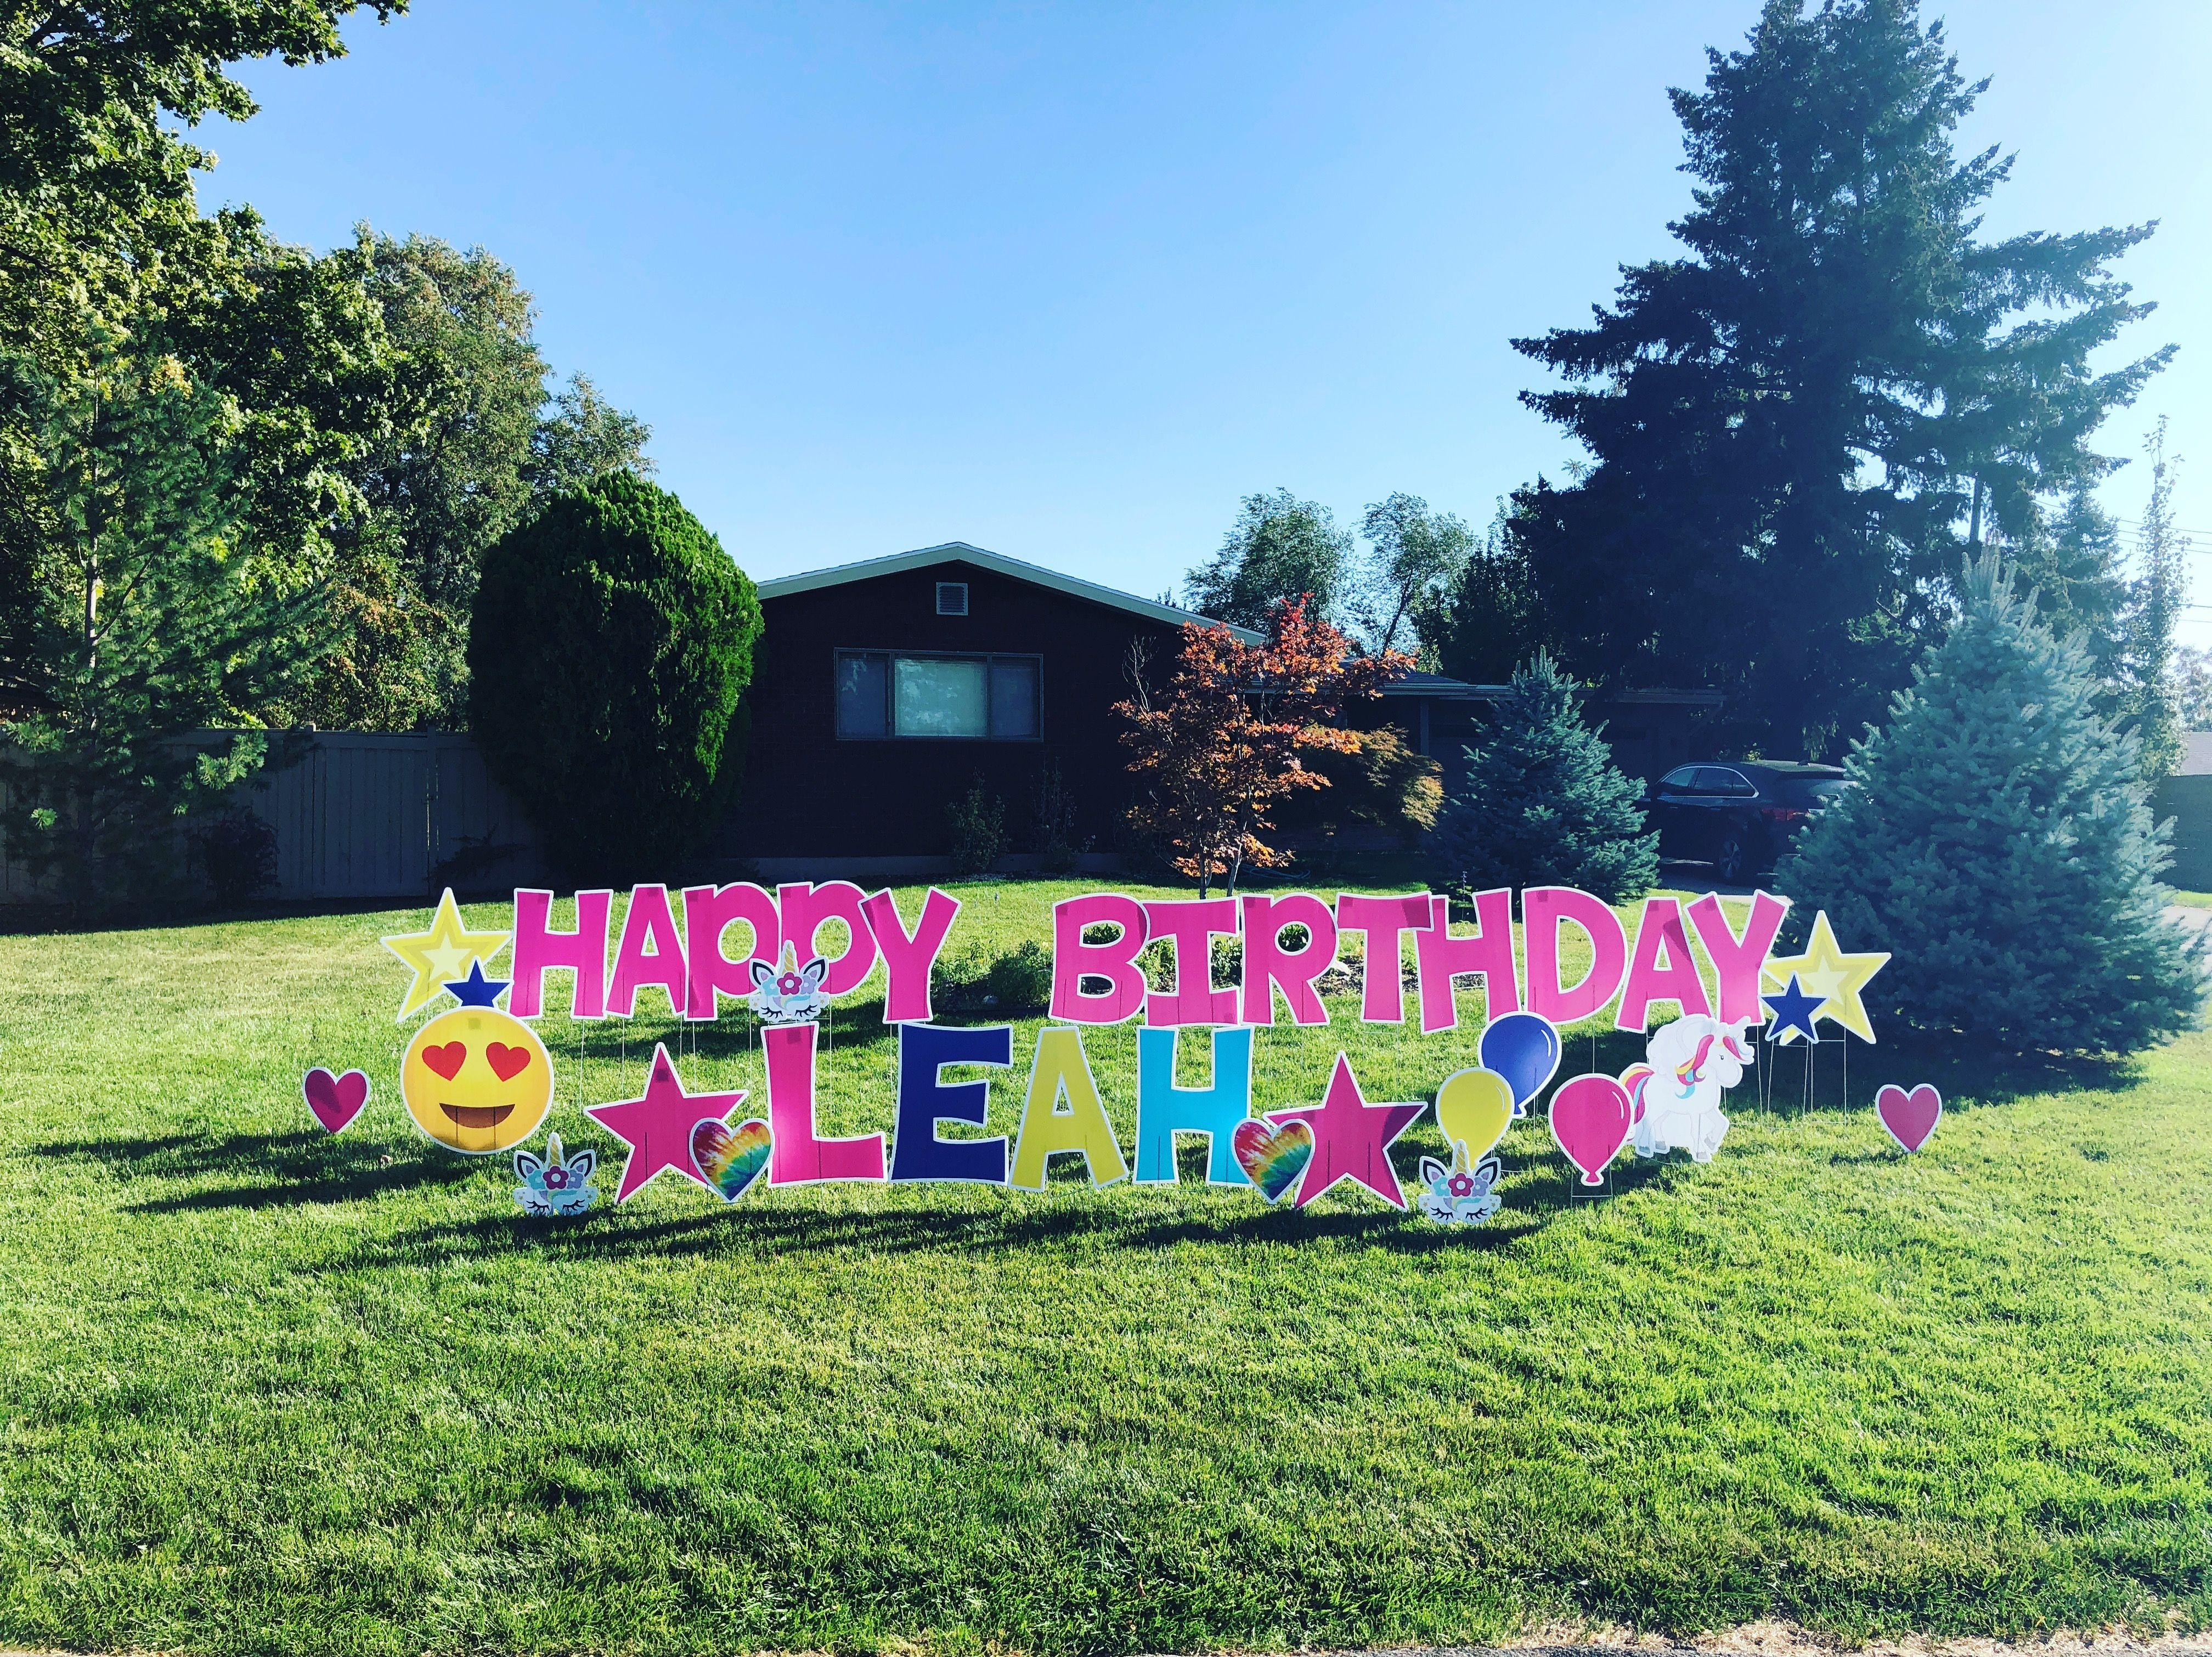 Happy Birthday Yard Sign Happy Birthday Yard Signs Birthday Yard Signs Happy Birthday Signs